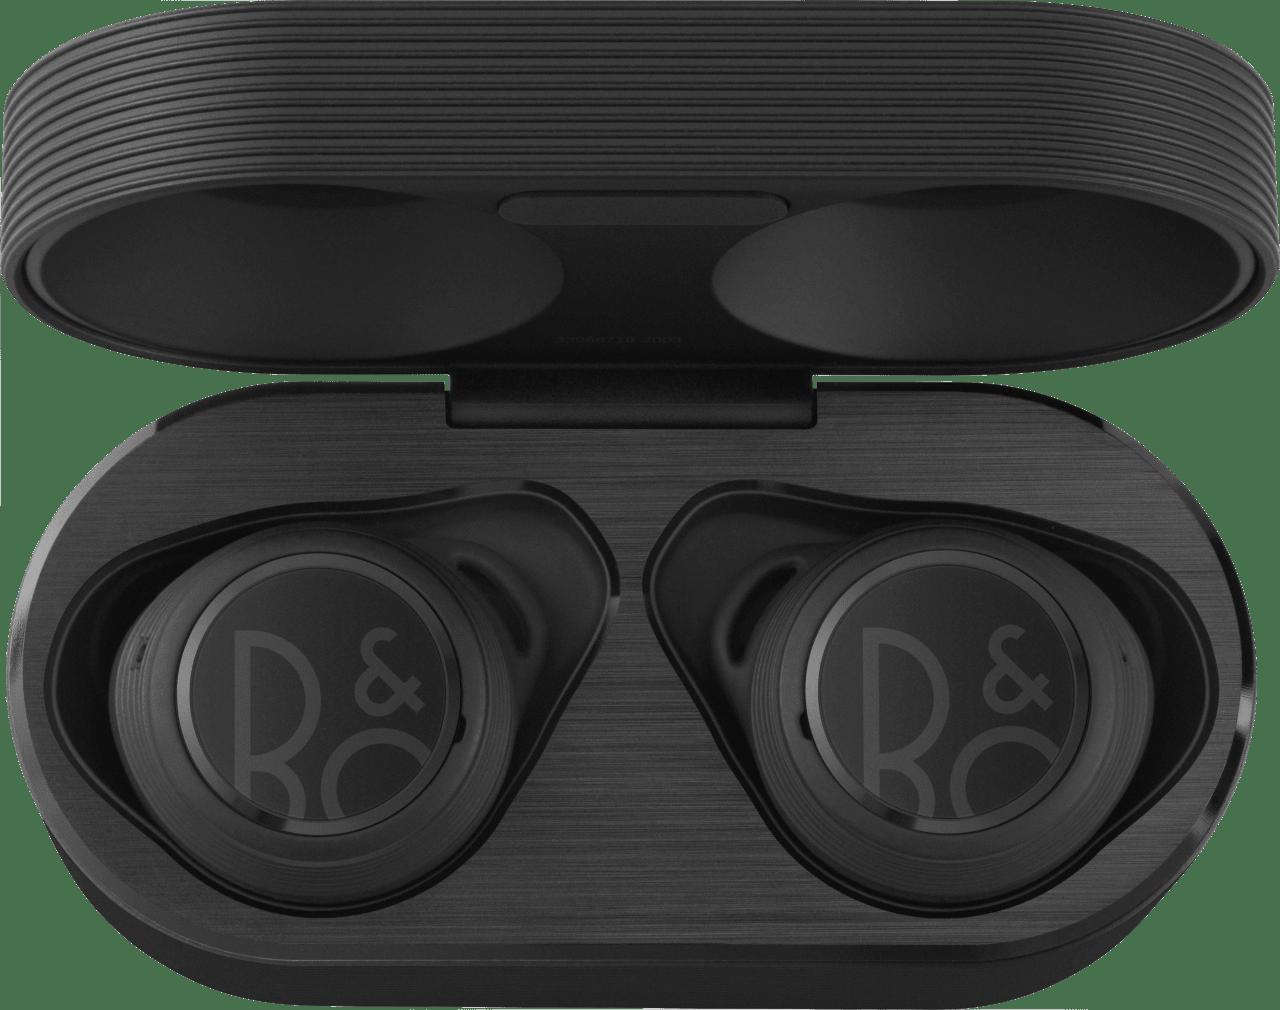 Black Bang & Olufsen Beoplay E8 Sport In-ear Bluetooth Headphones.4